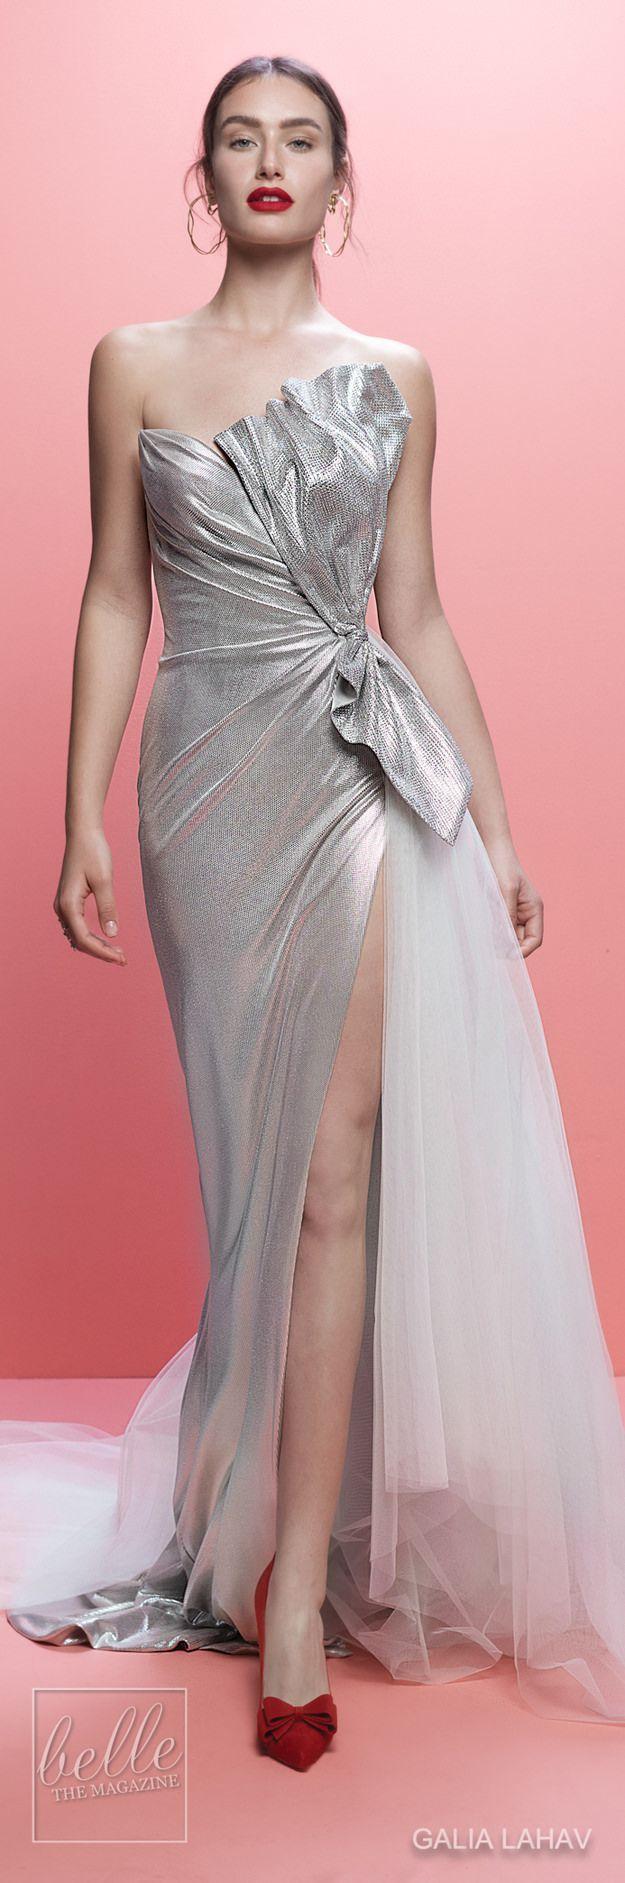 Lujoso Vestidos De Novia Jlm Couture Colección - Colección de ...